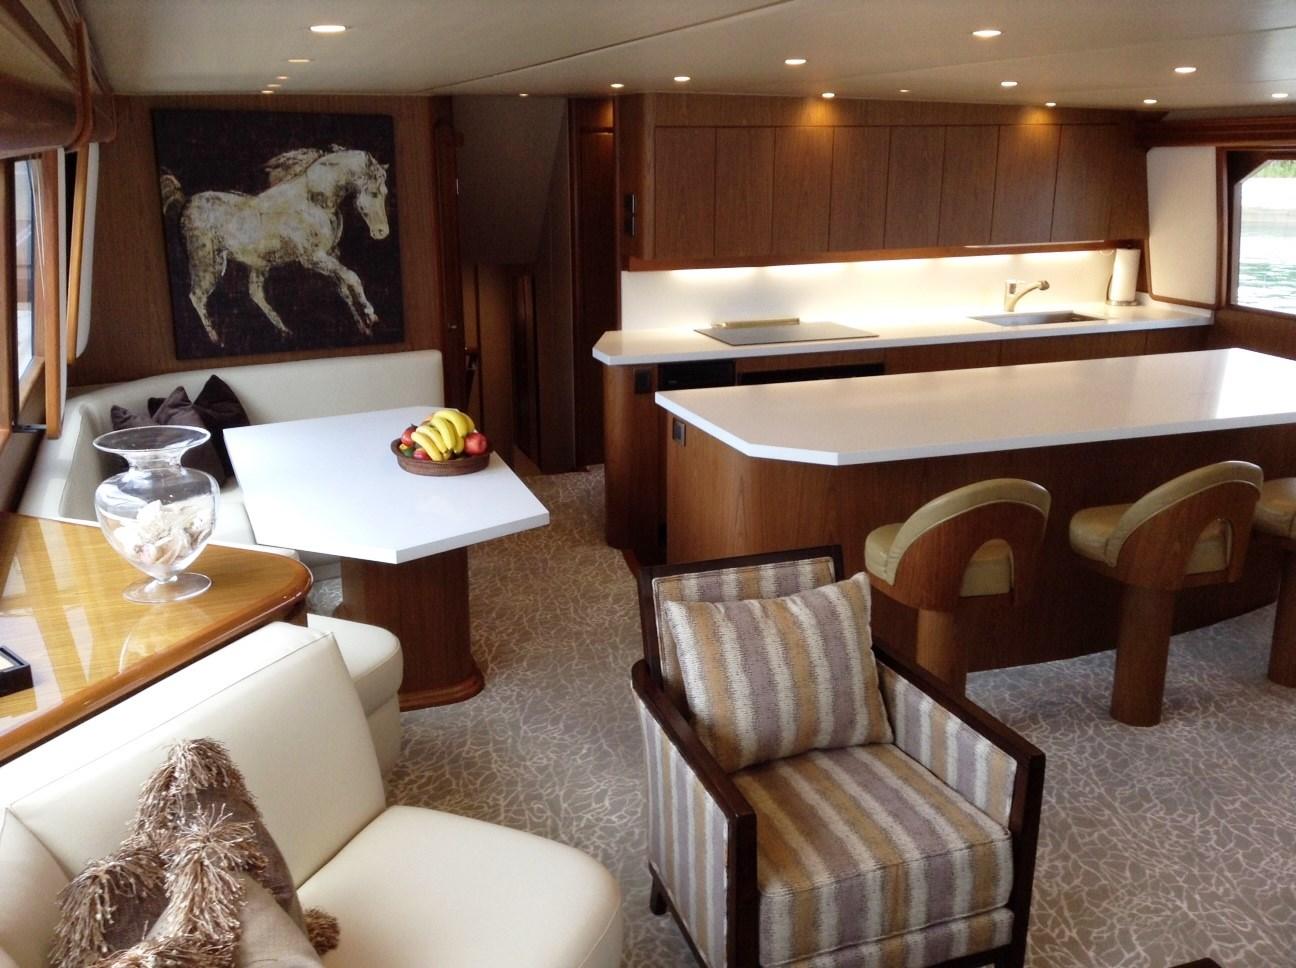 Viking motor yacht MUSTANG SALLY - Dining and wet bar